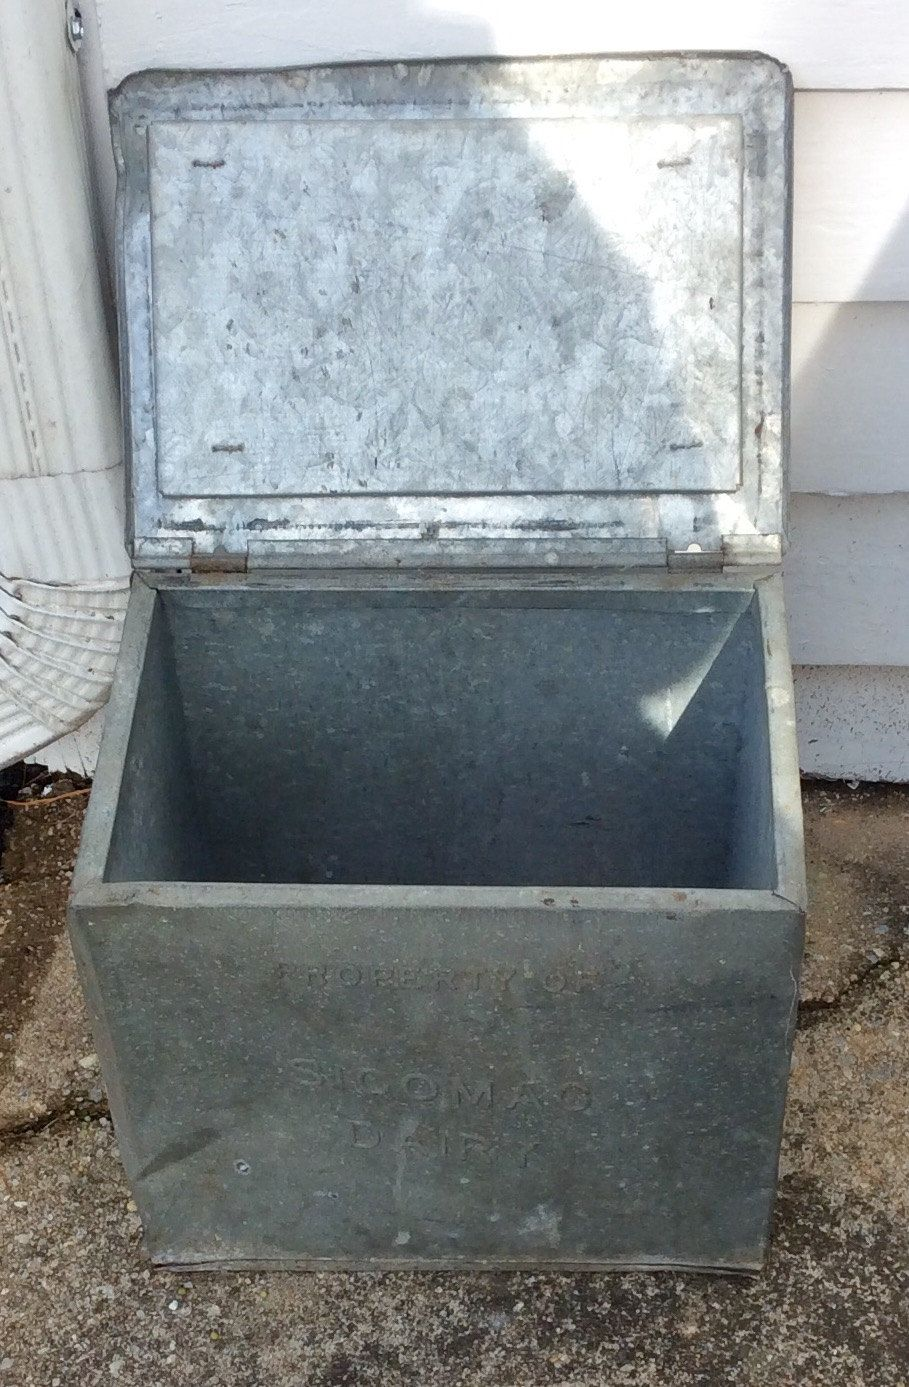 Vintage Galvanized Metal Fence Top Finial Fence Post: Vintage Sicomac Dairy Galvanized Metal Lidded Outdoor Milk